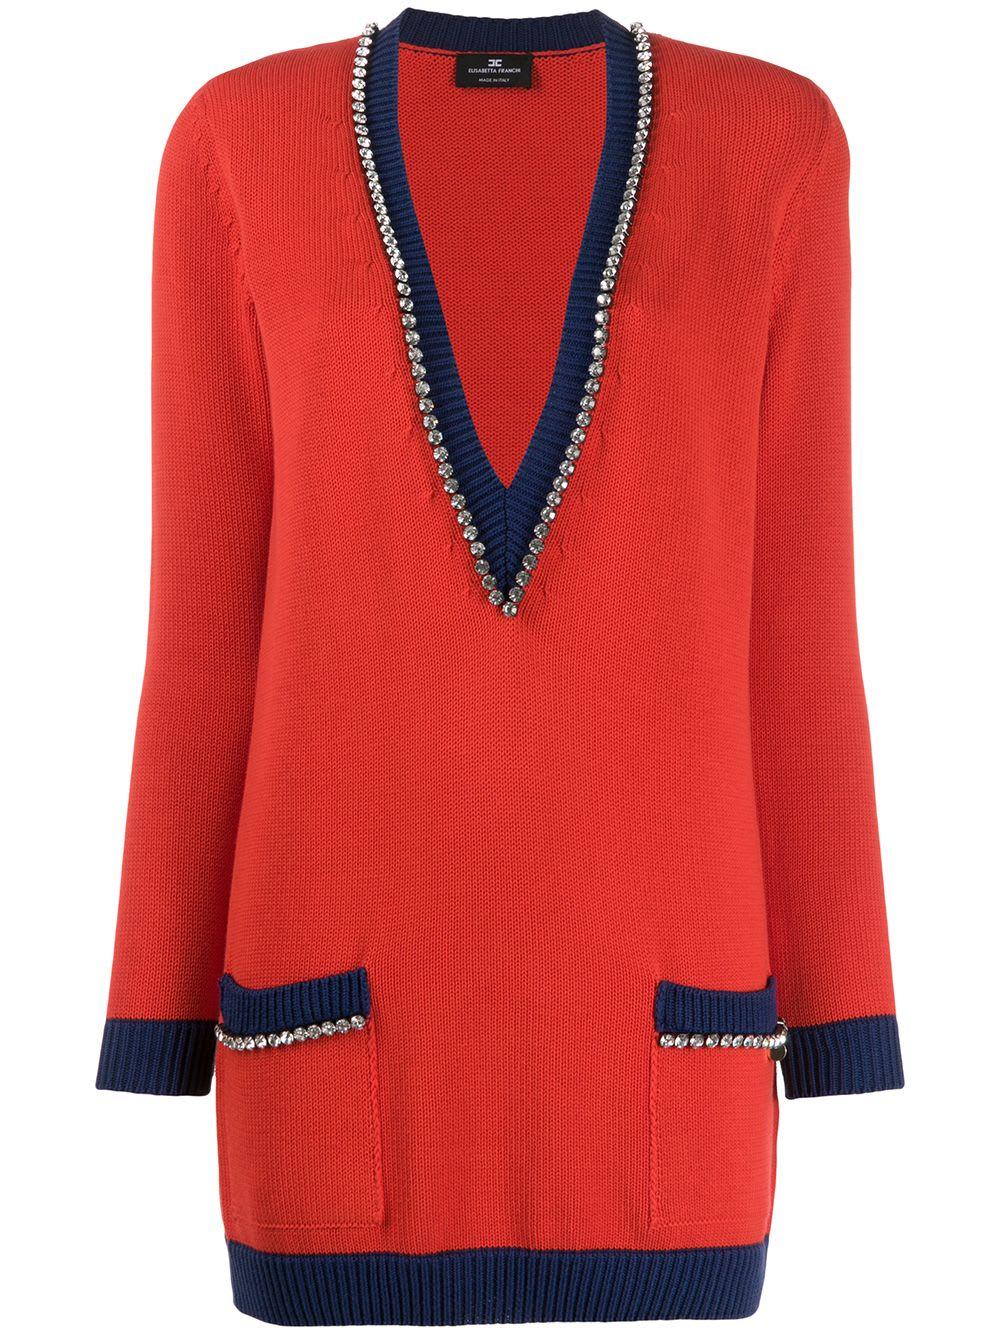 Buy Elisabetta Franchi Celyn B. Knitted Dress online, shop Elisabetta Franchi Celyn B. with free shipping